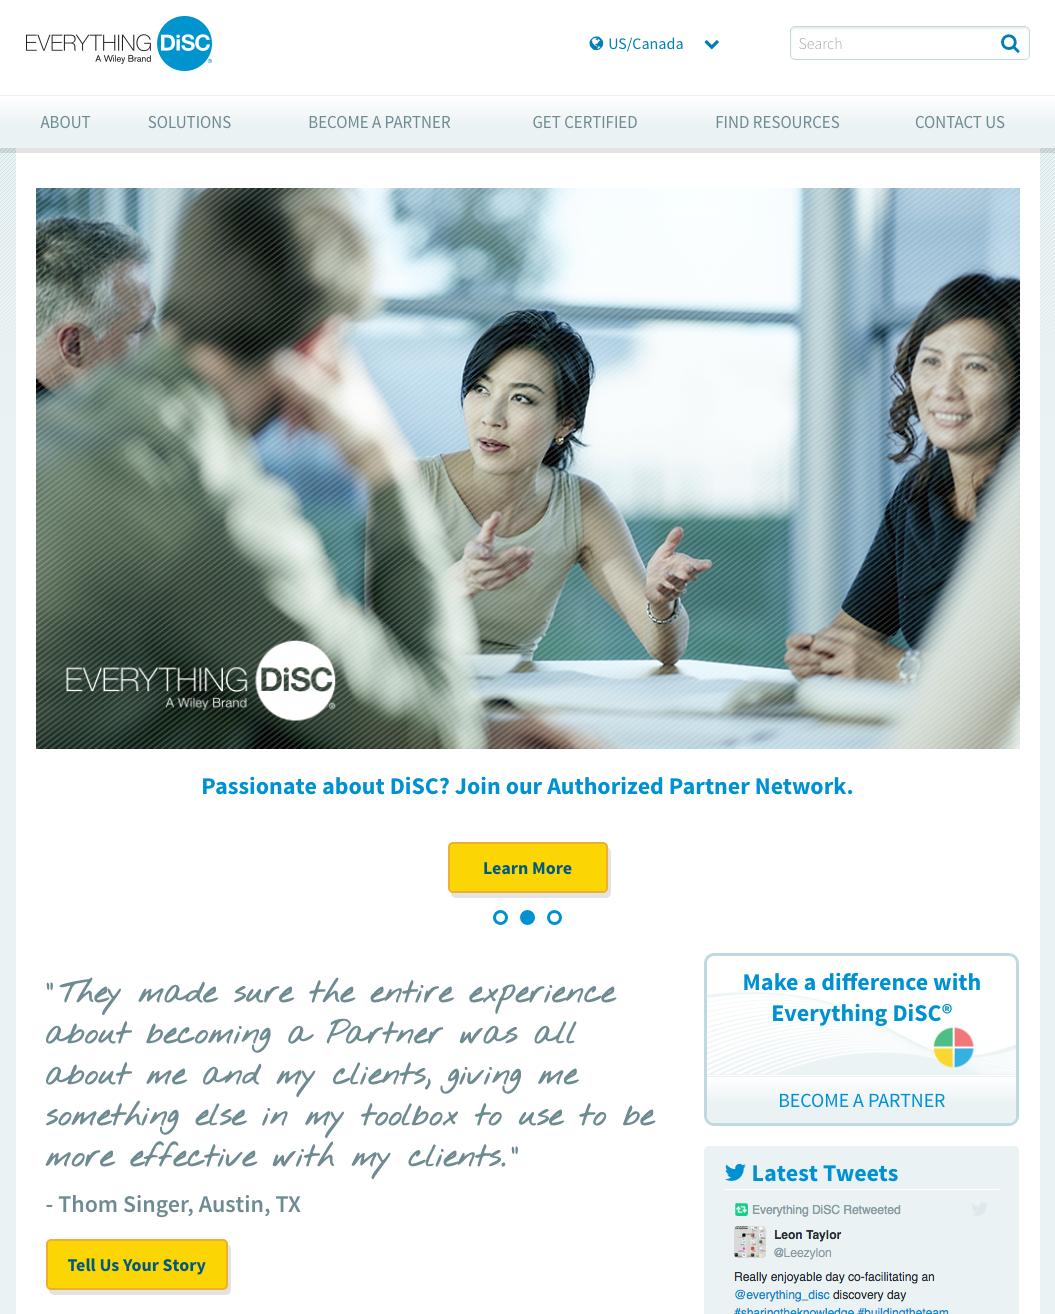 EverythingDiSC website